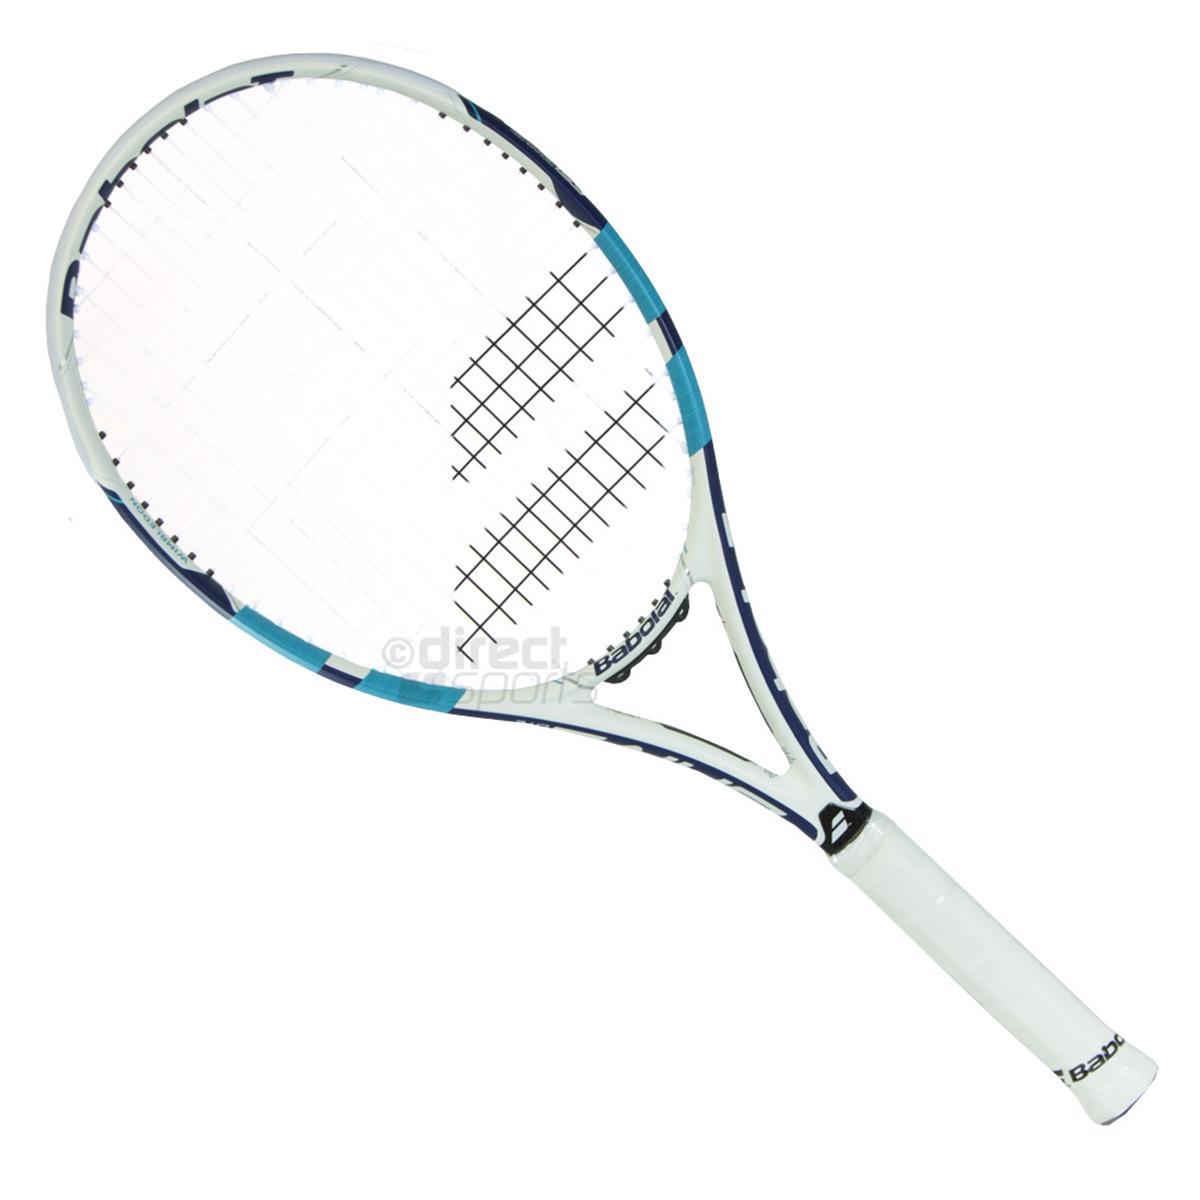 babolat wimbledon pure drive lite tennis racket direct tennis. Black Bedroom Furniture Sets. Home Design Ideas